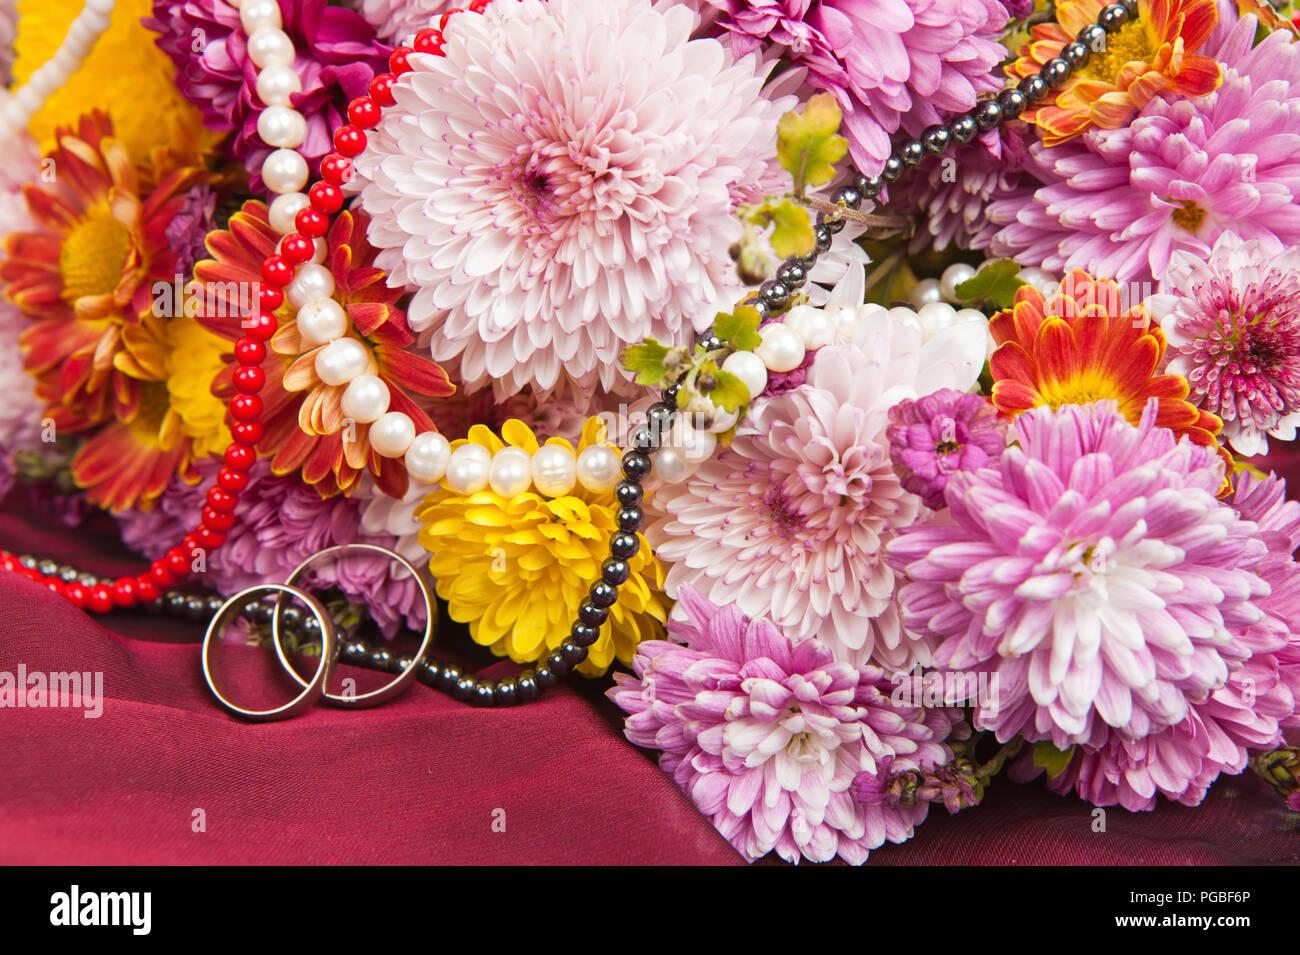 Wedding Rings Flowers On Fabric Stock Photos & Wedding Rings Flowers ...